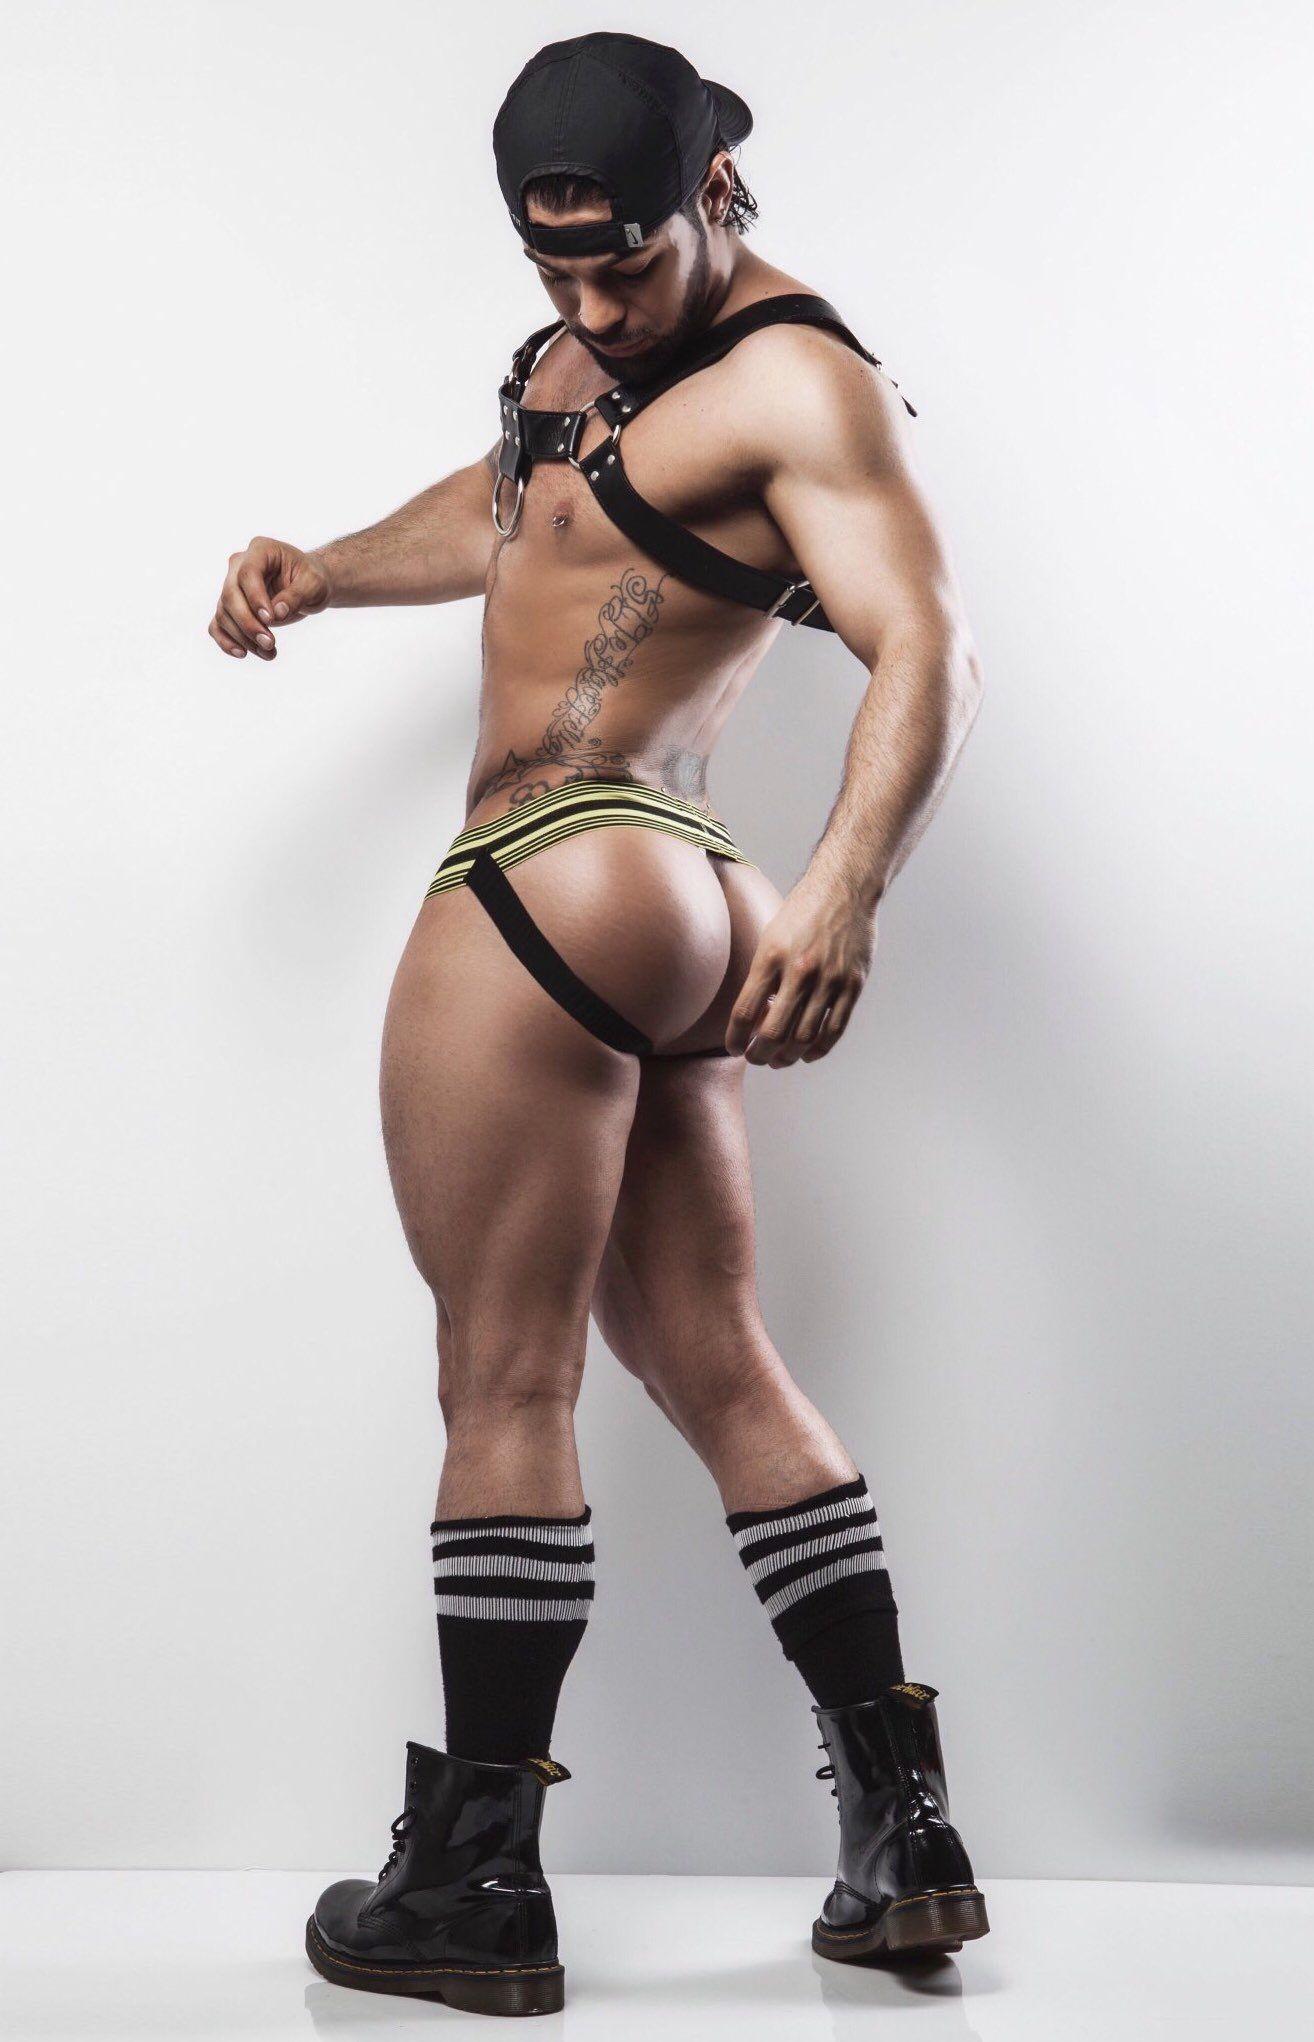 Nude girls squatting